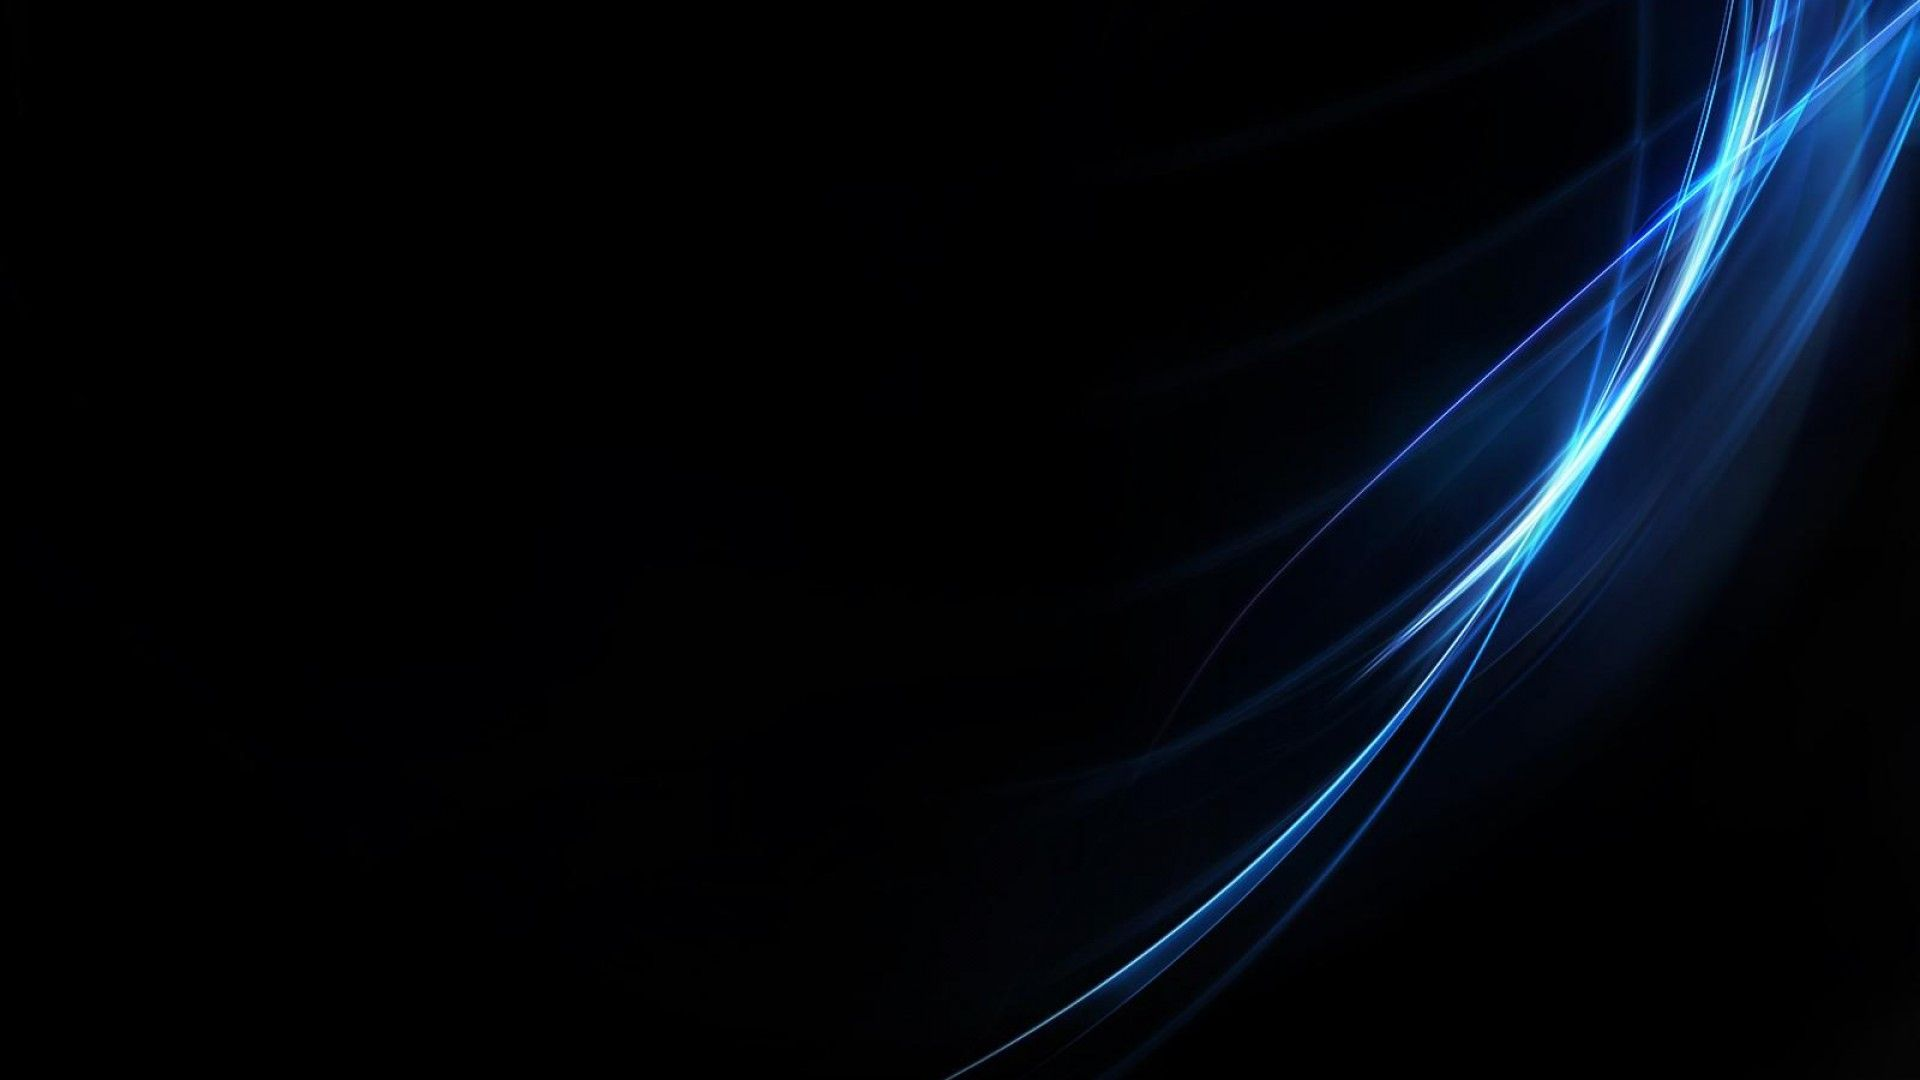 Xperia style blue Black Wallpaper